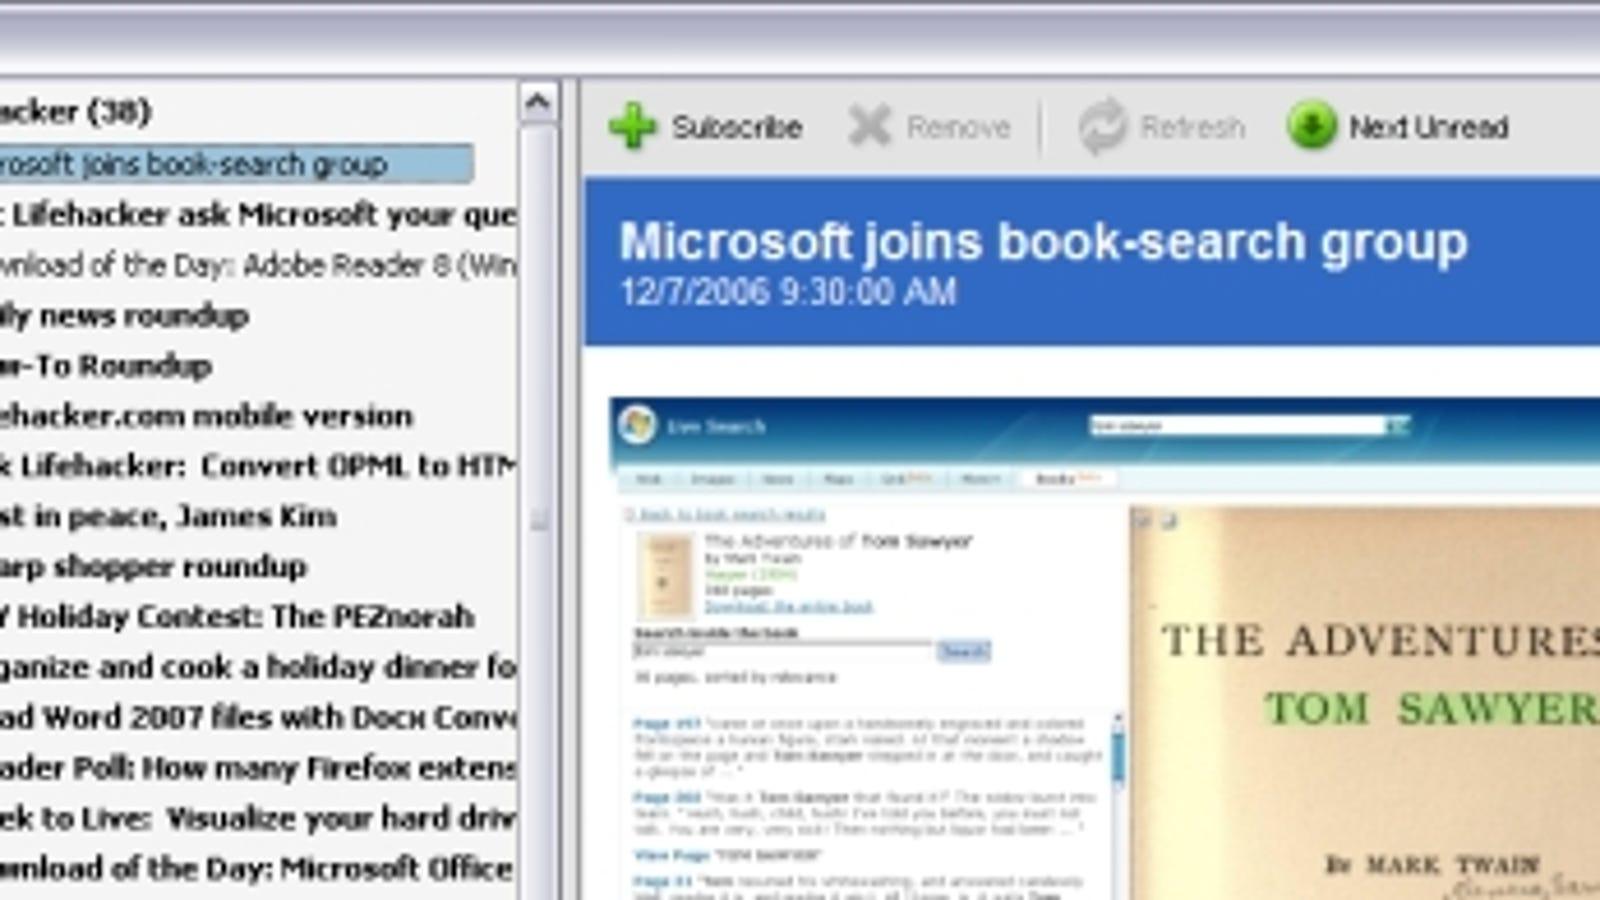 Use Adobe Reader 8 as an RSS reader